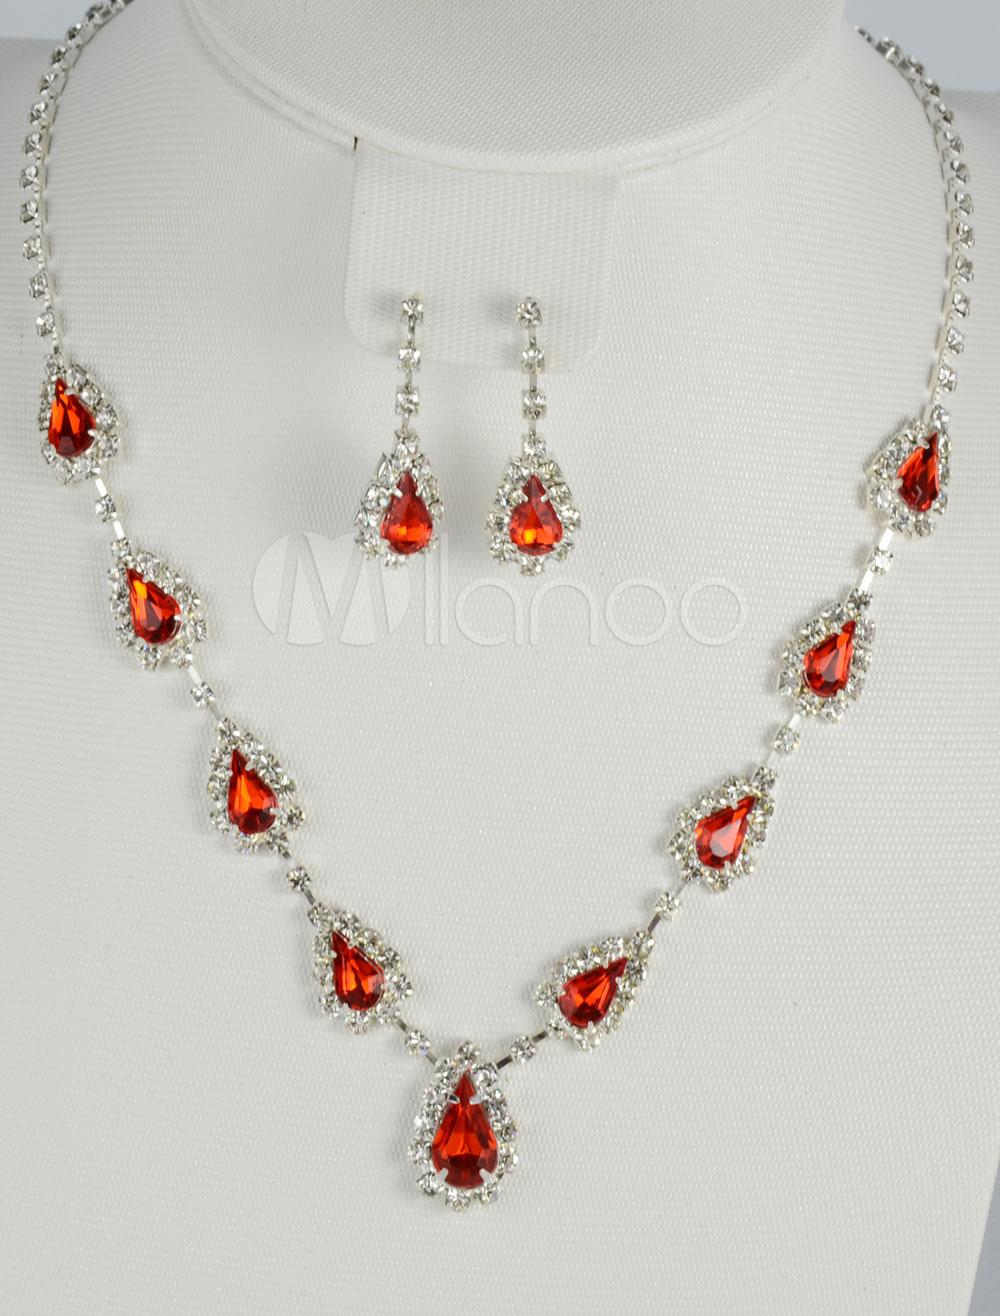 Charming Metal Rhinestone Jewelry Set For Bridal